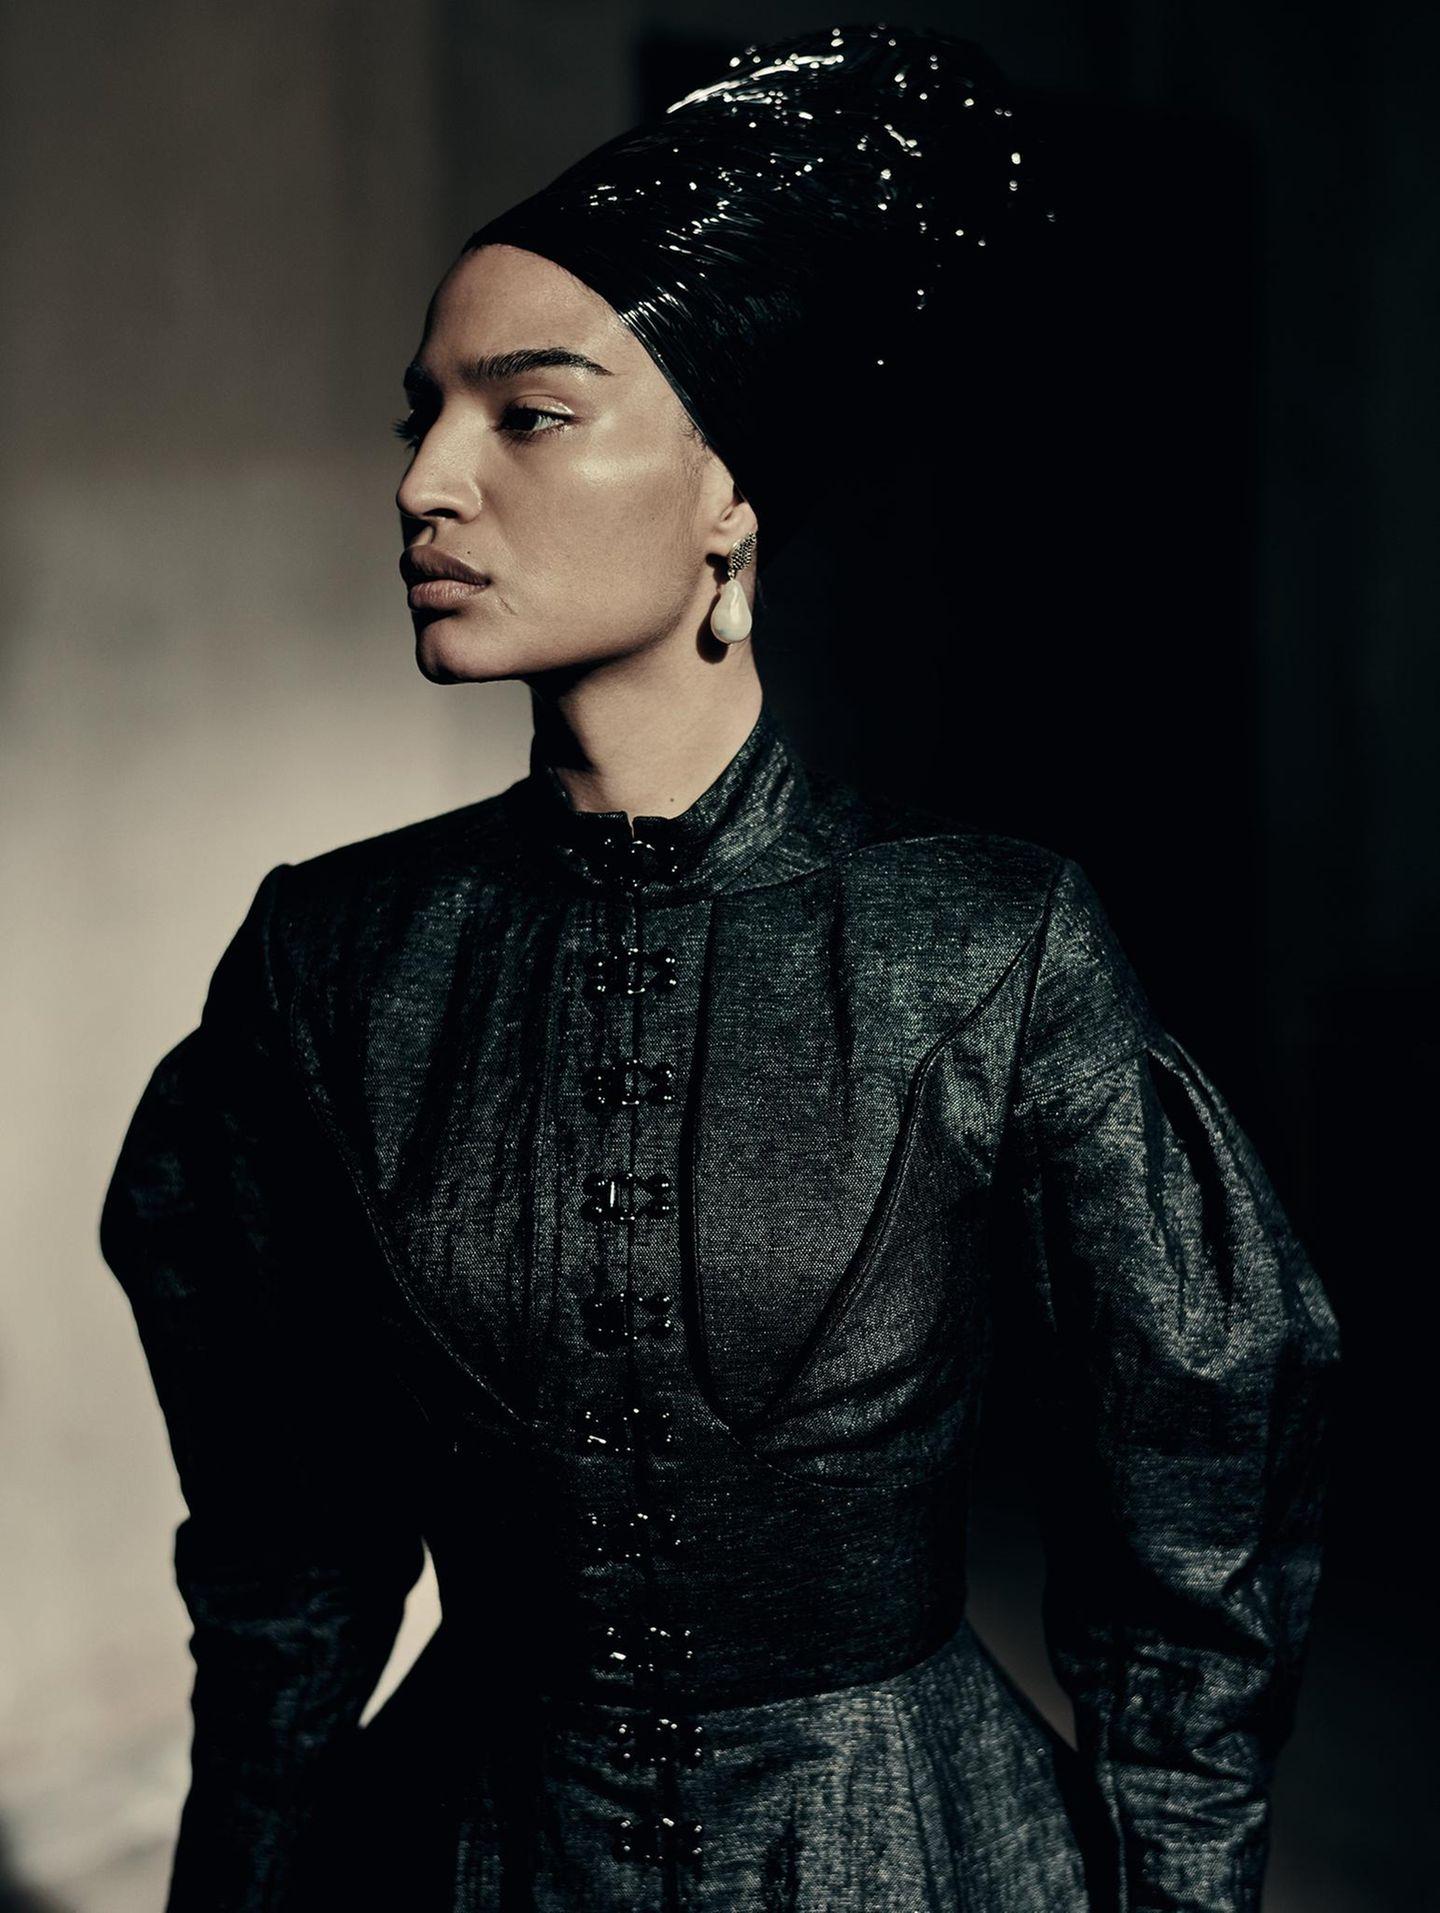 Nackt  Indya Moore 'Pose' star